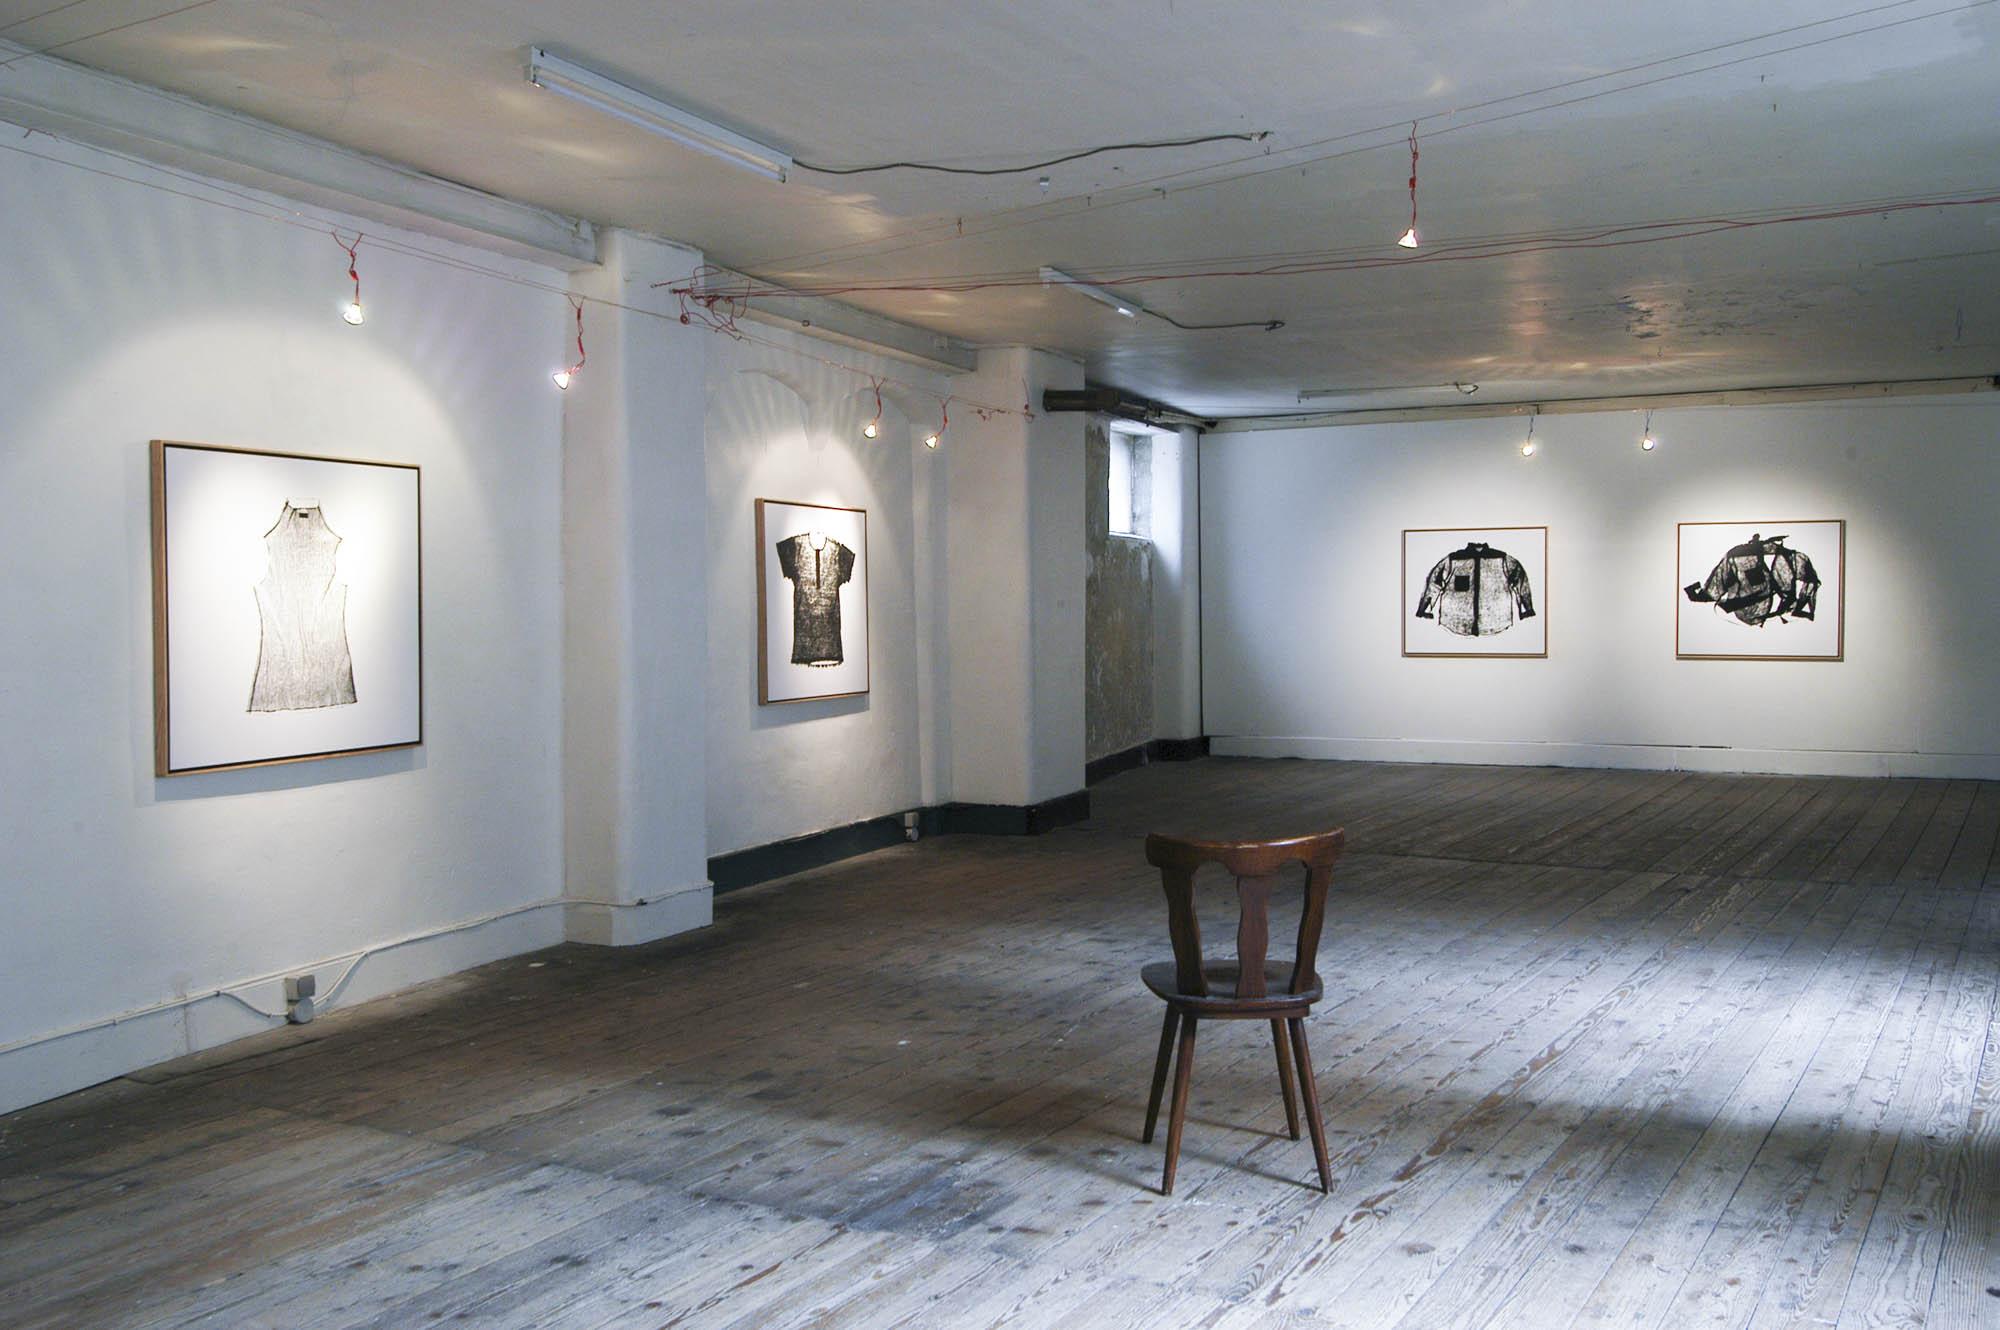 Exhibition solo at Galerie STIMULTANIA, 2005 (Strasbourg)